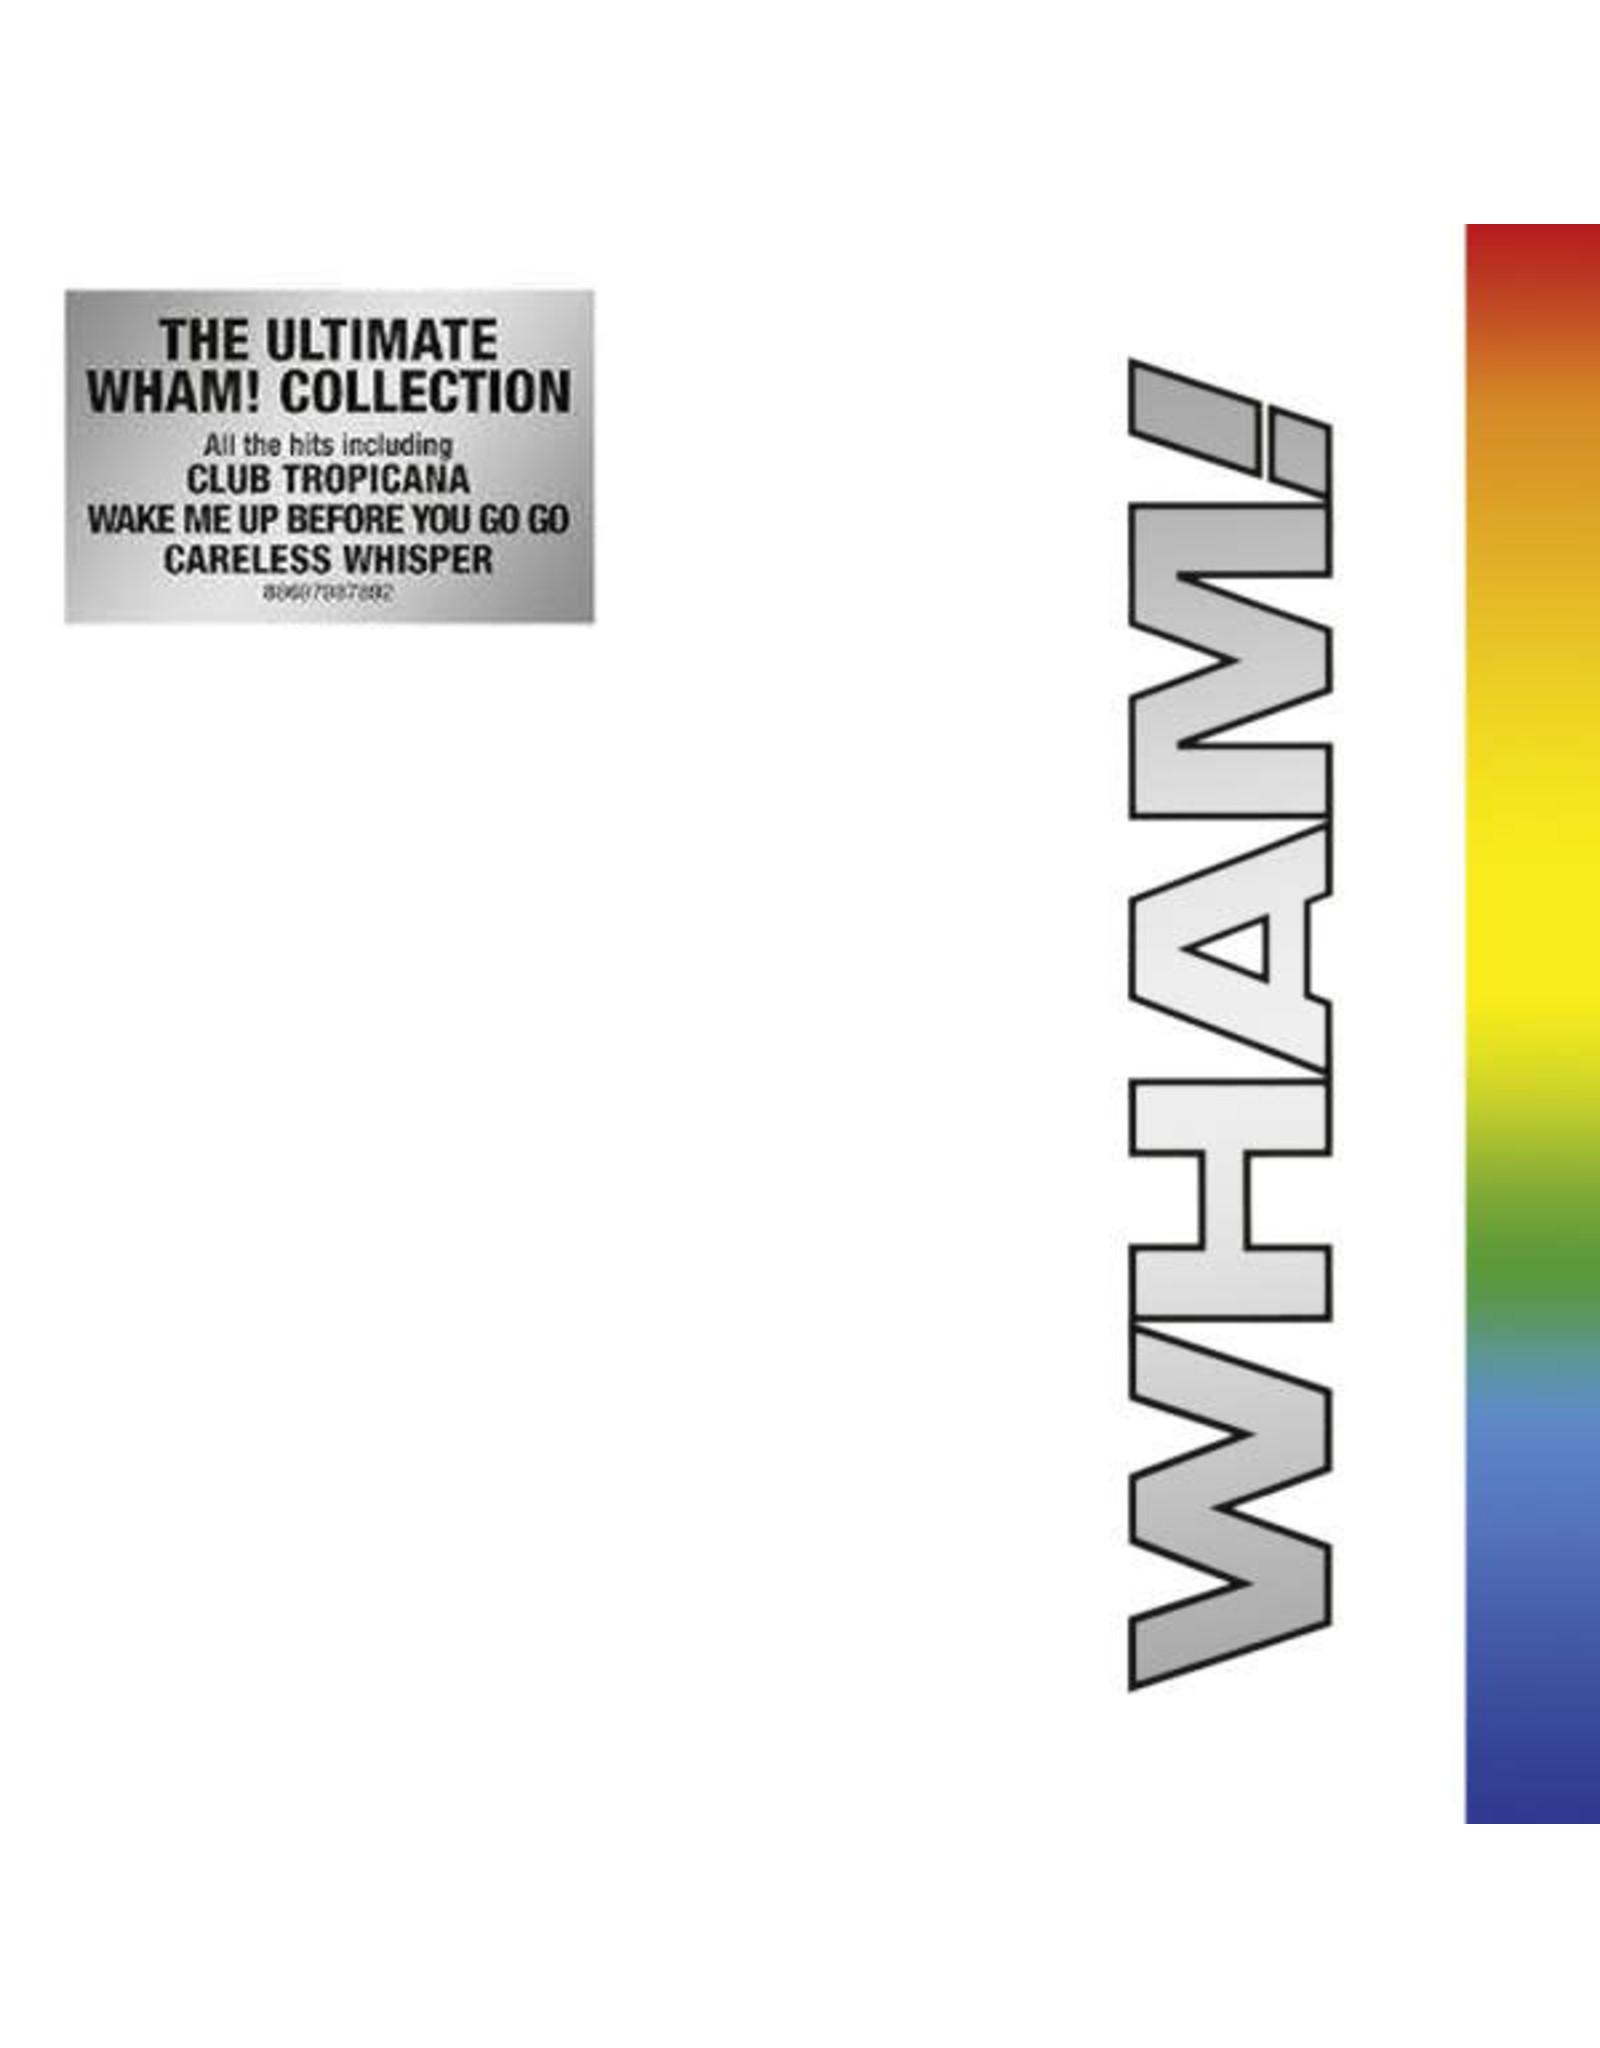 Wham! - Final CD